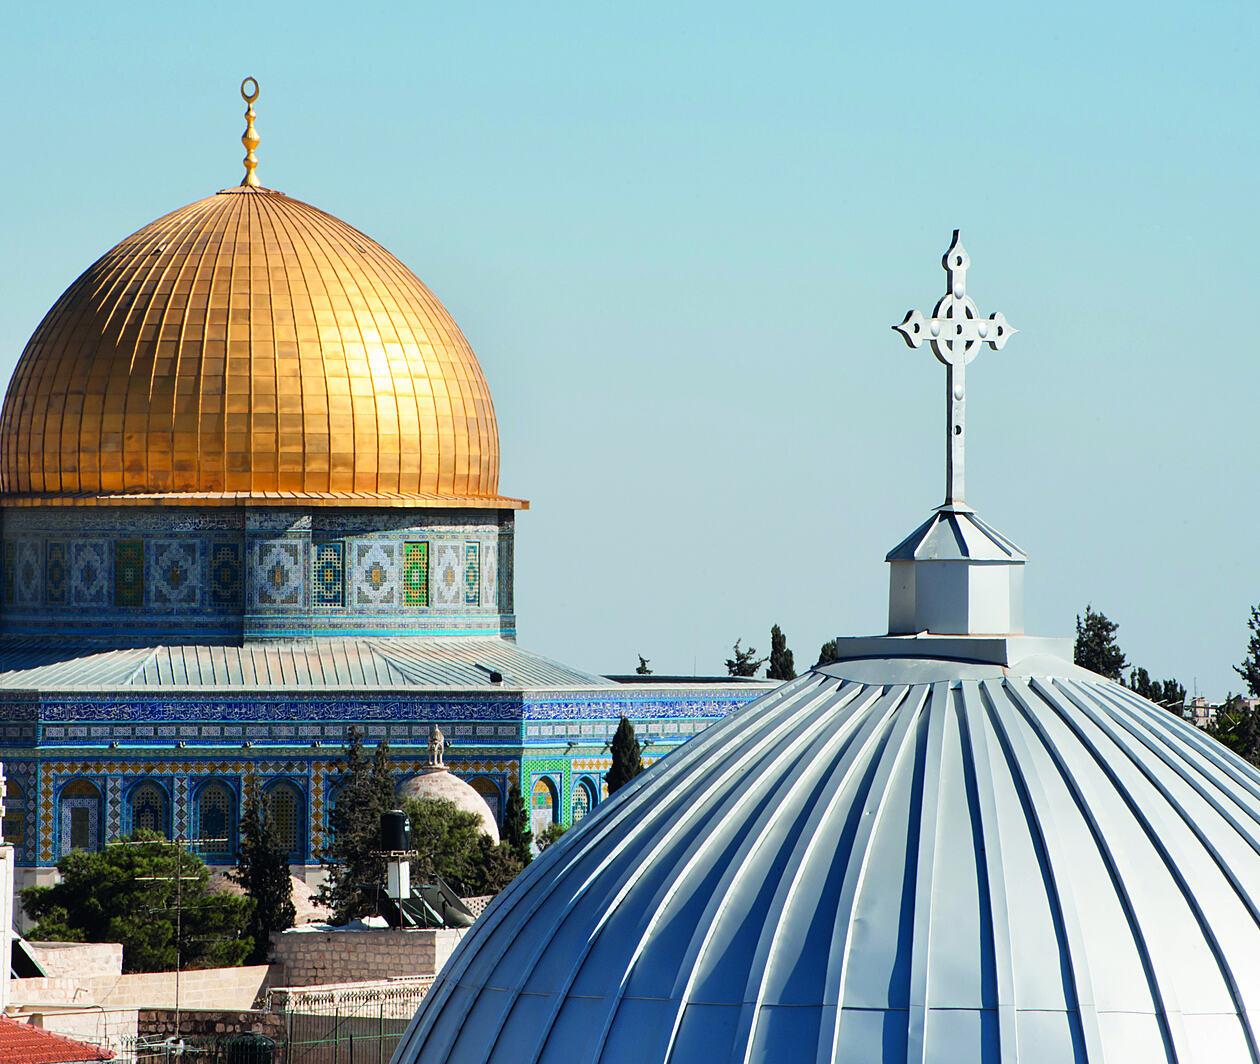 Christian-Muslim Relations